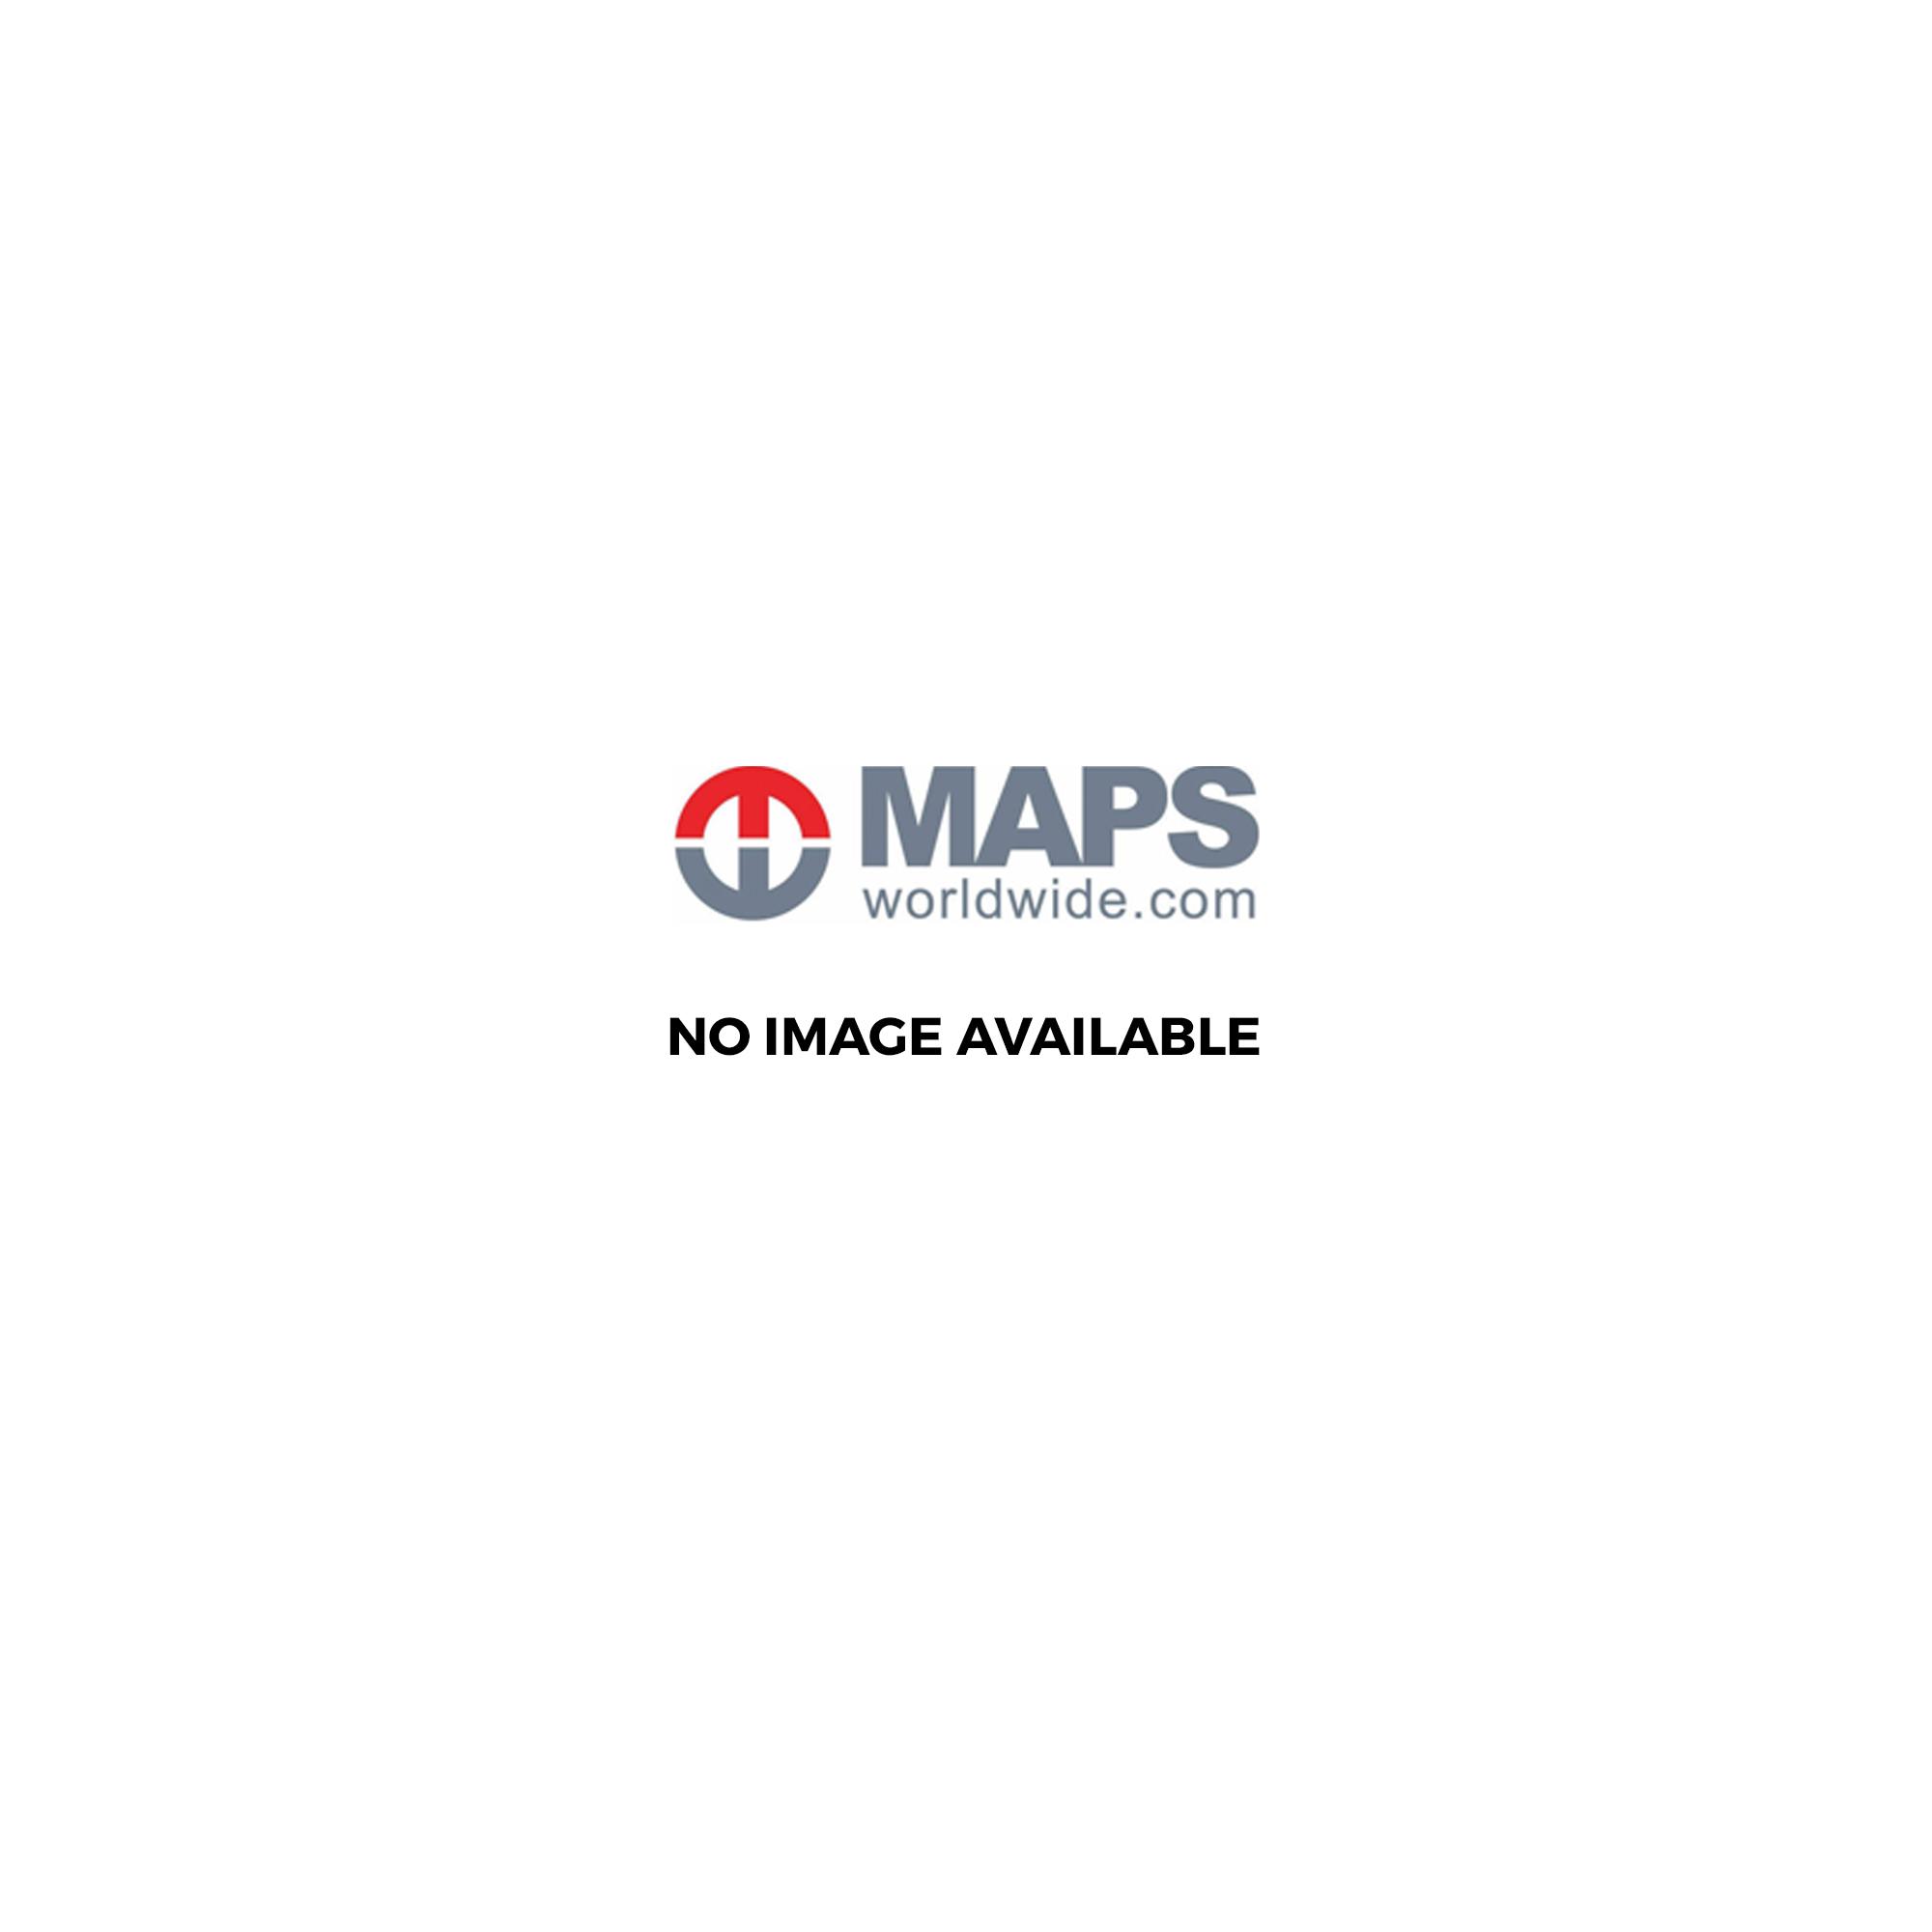 2417OTR Foret de Fontainebleau Waterproof Map Europe from Maps